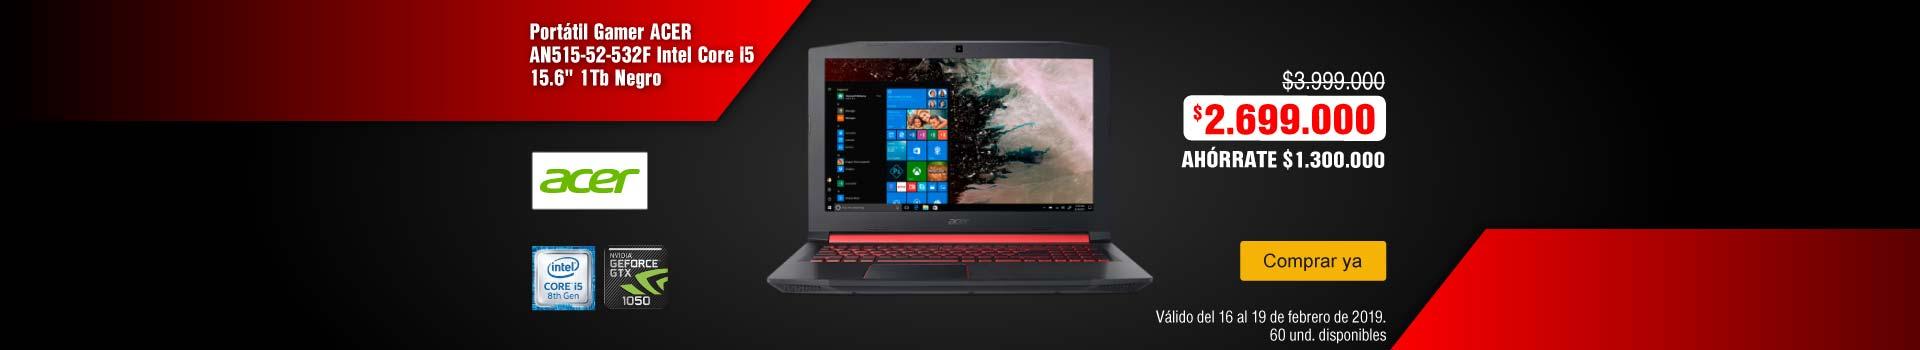 AK-KT-BCAT-1-computadores y tablets-gaming-PP---Port 15' Acer 532F Ci5 Ng Gmr_feb15GC